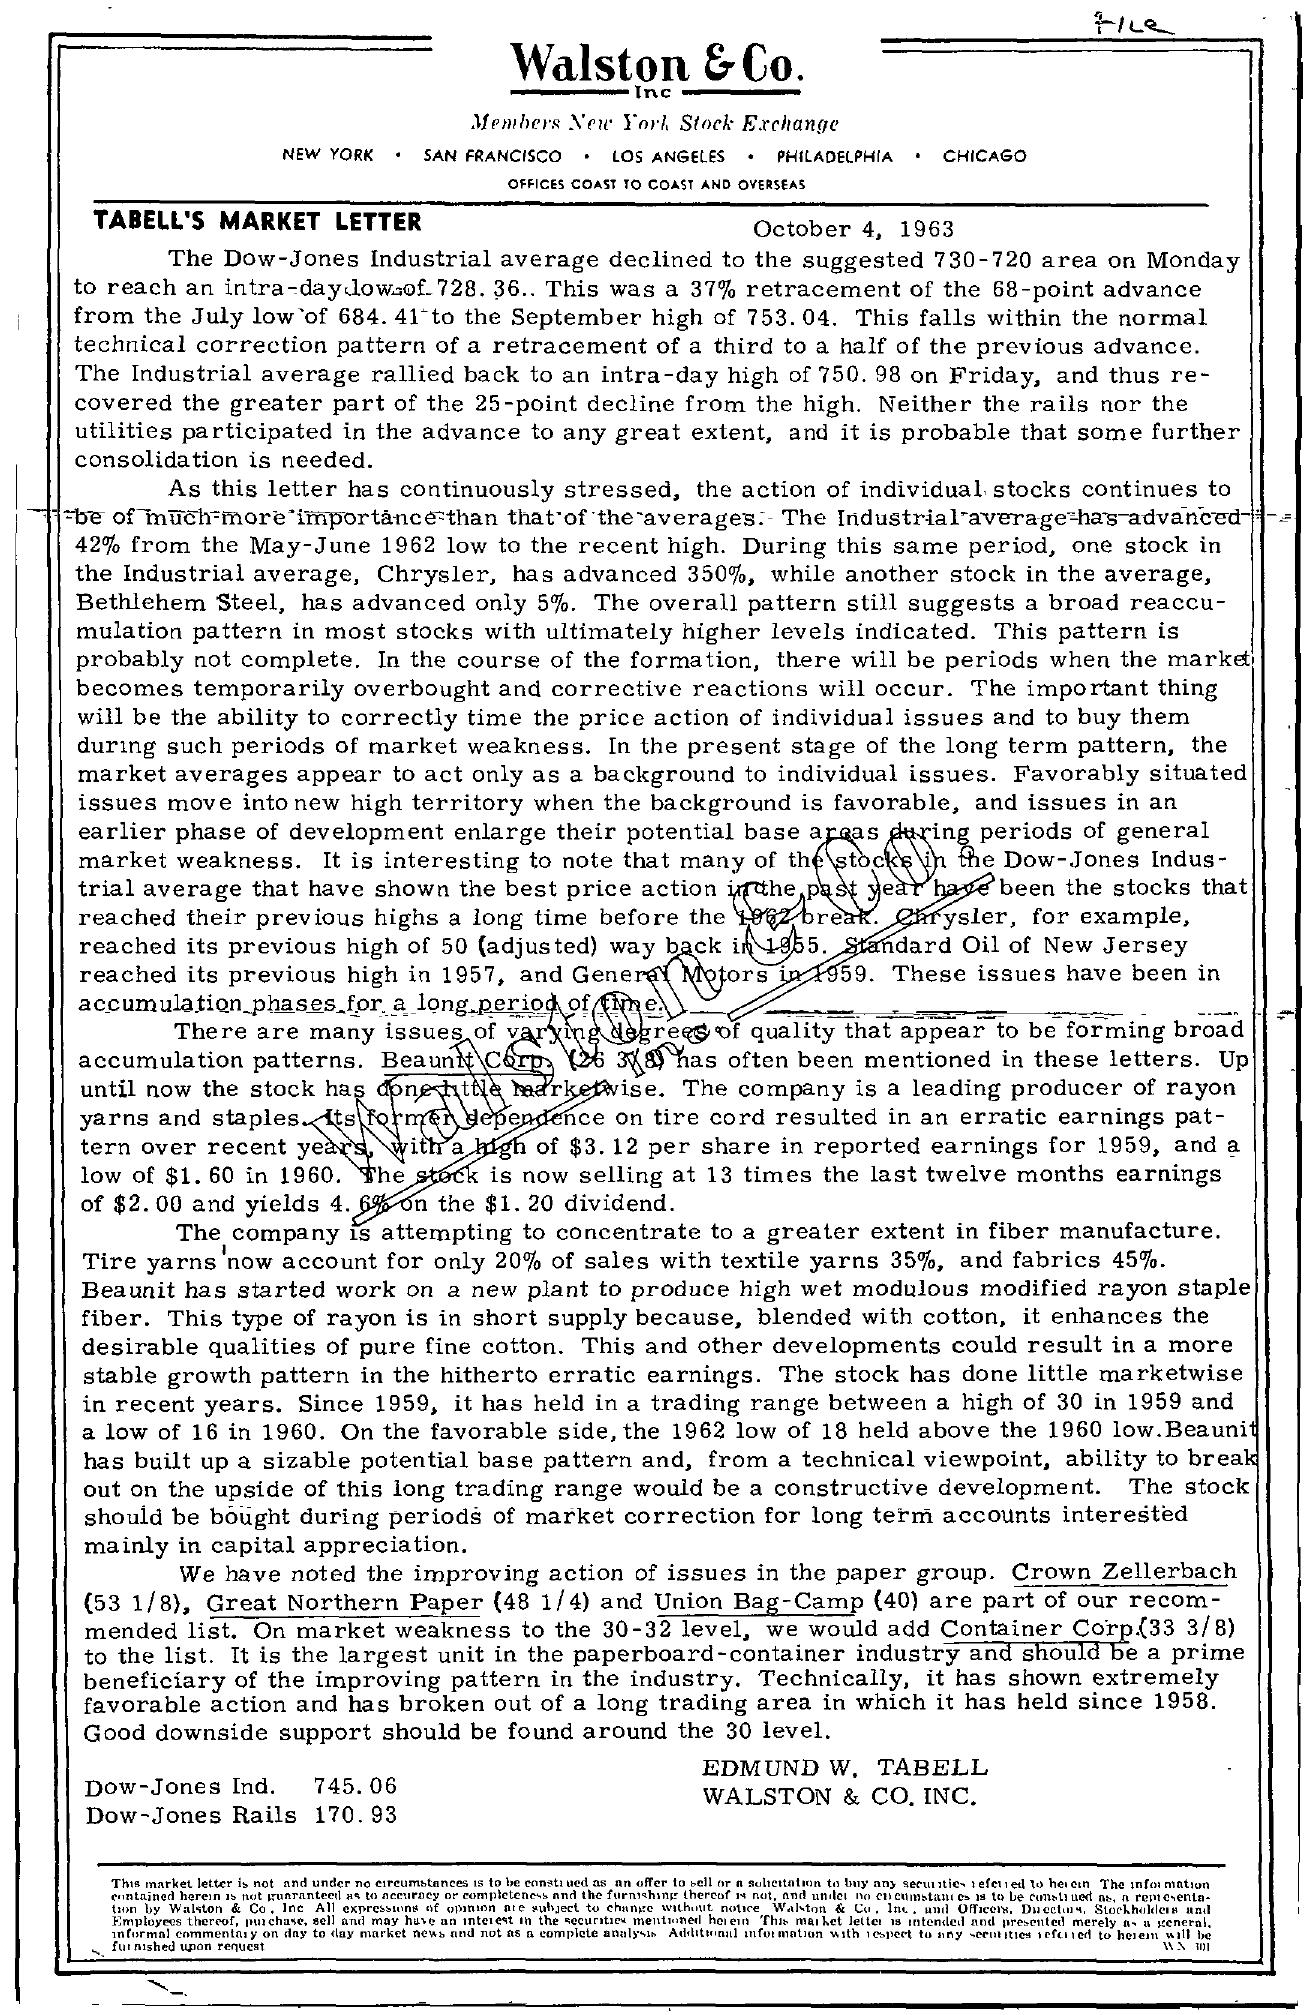 Tabell's Market Letter - October 04, 1963